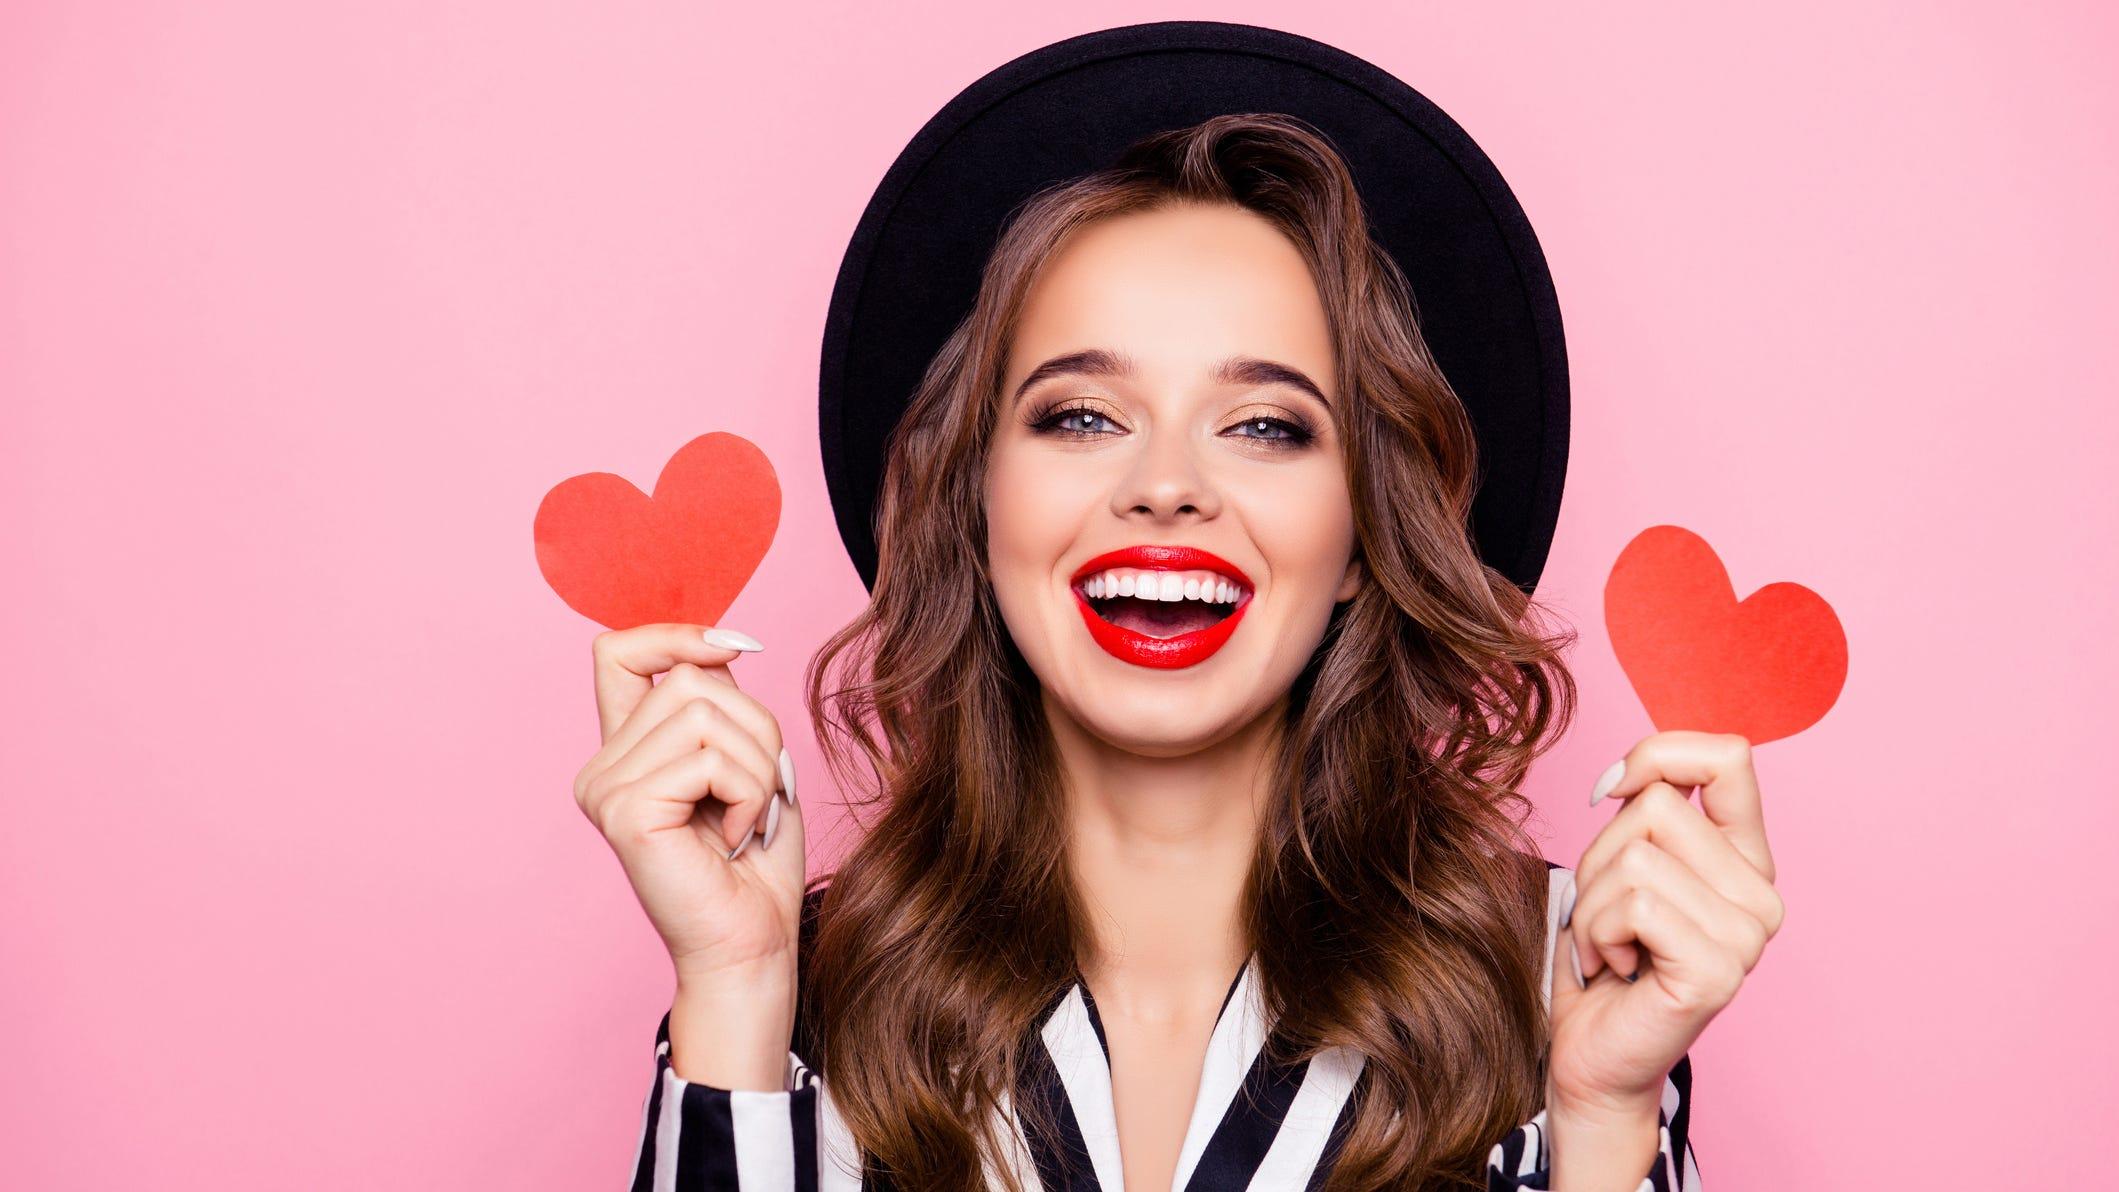 The Victoria's Secret Semi-Annual Sale just got even better with this bonus deal